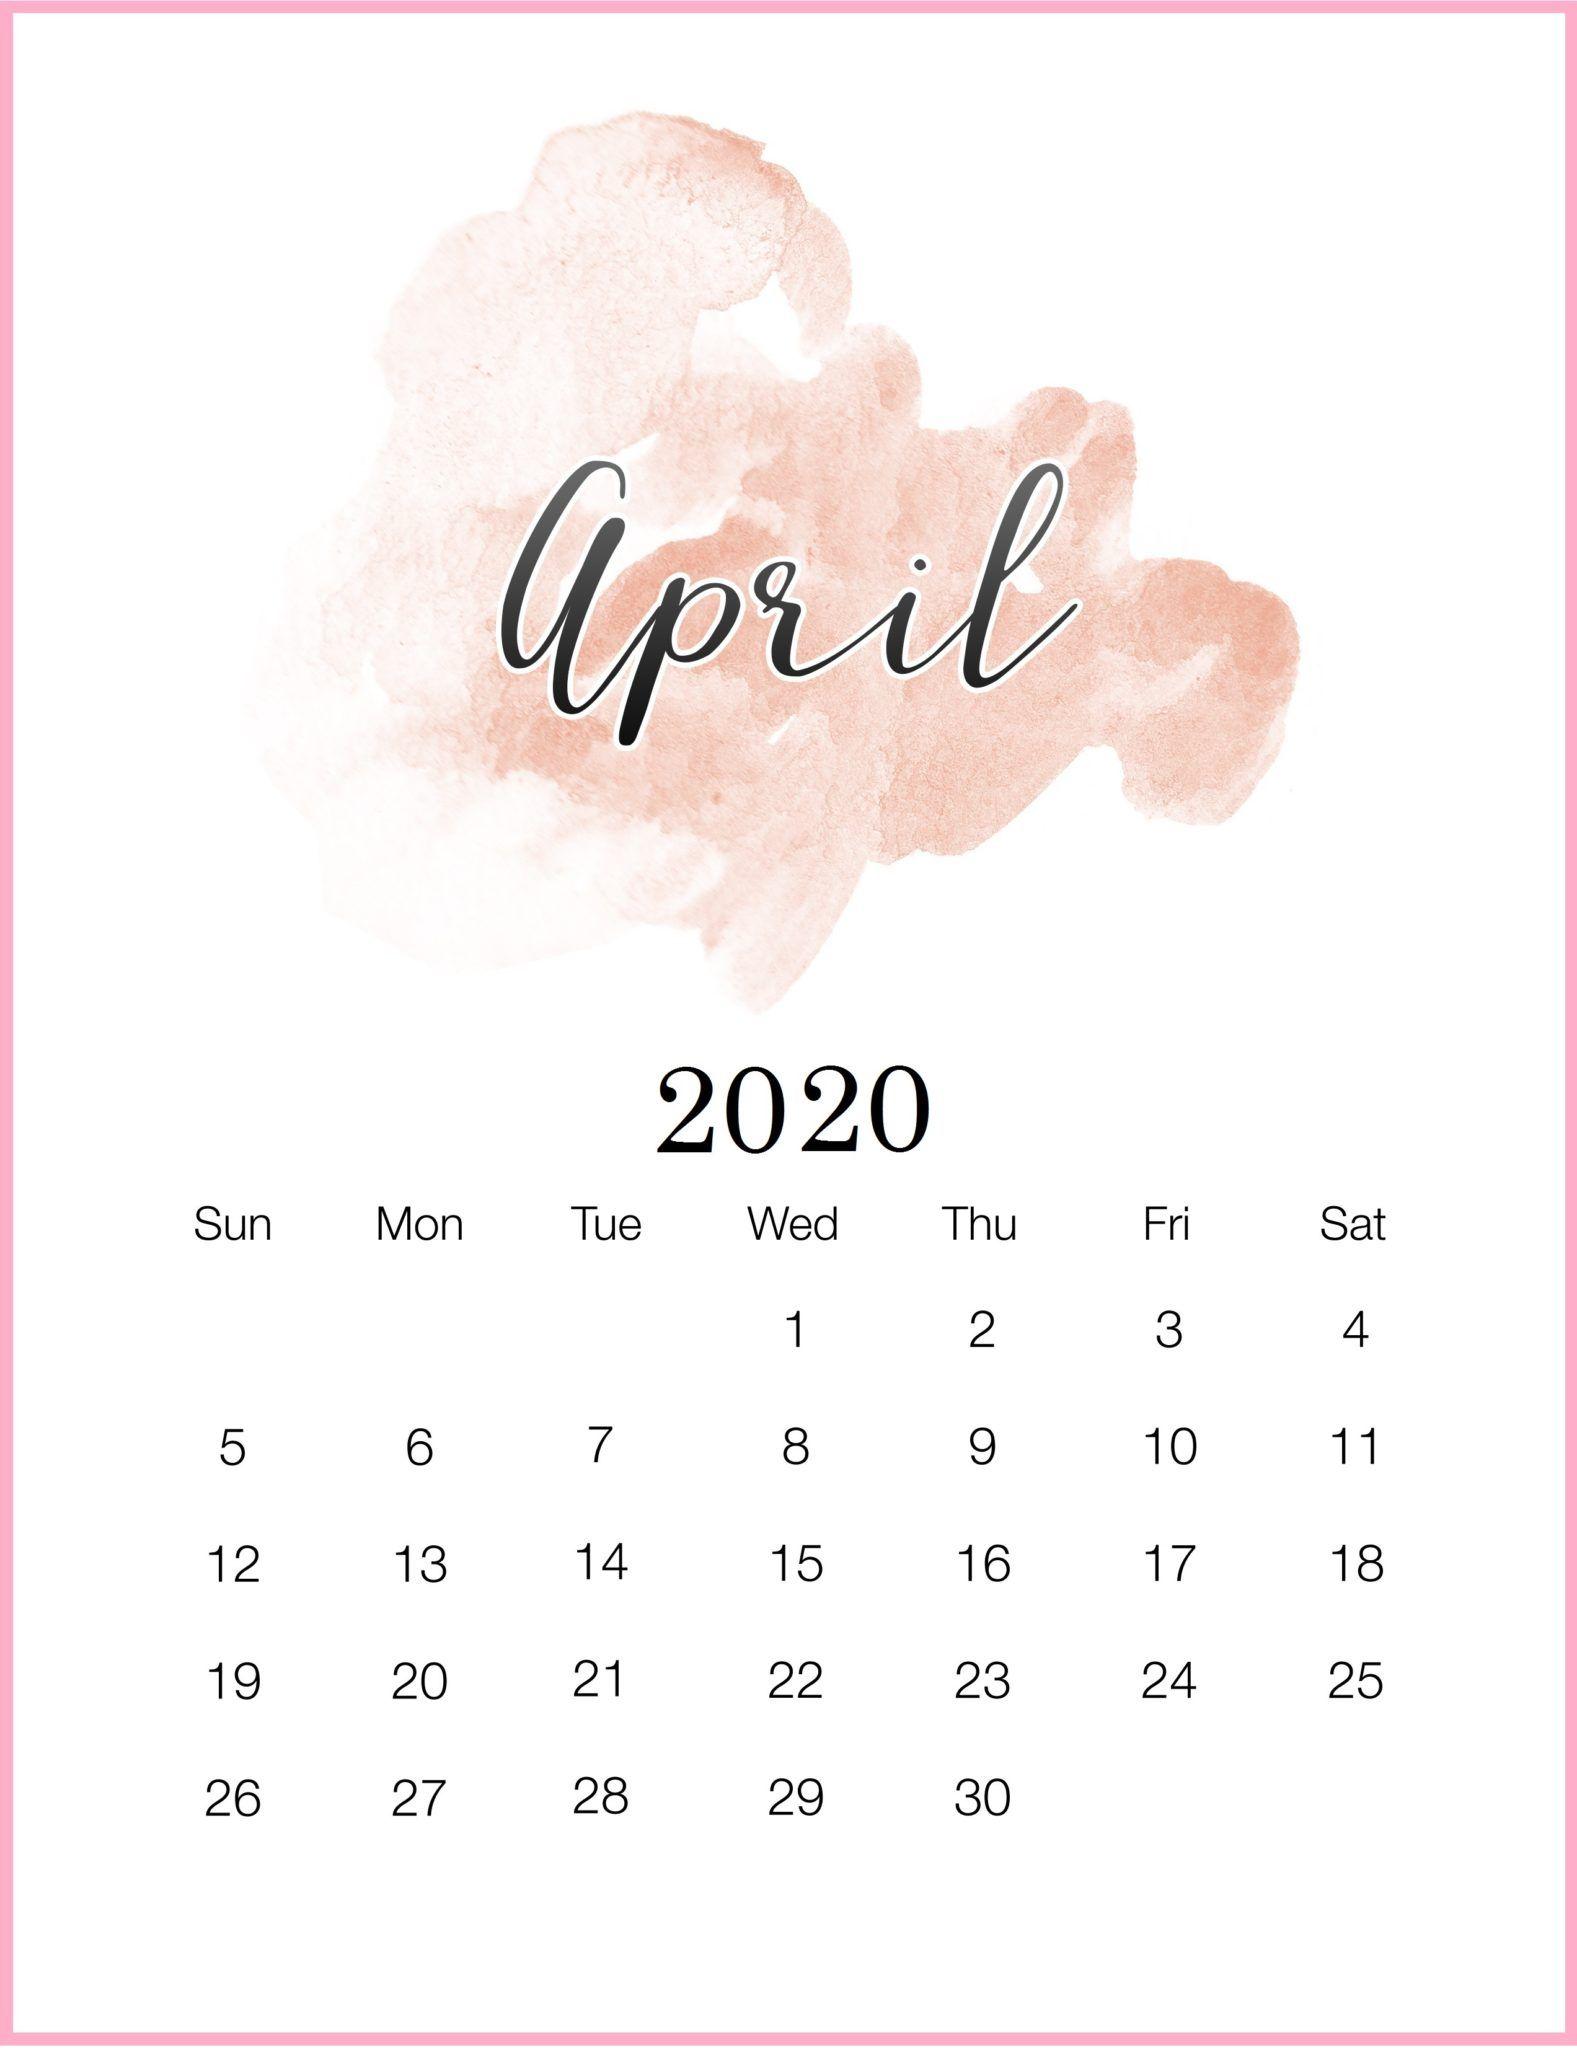 Watercolor April 2020 Wall Calendar Watercolor Calendar Calendar Wallpaper Calendar Printables